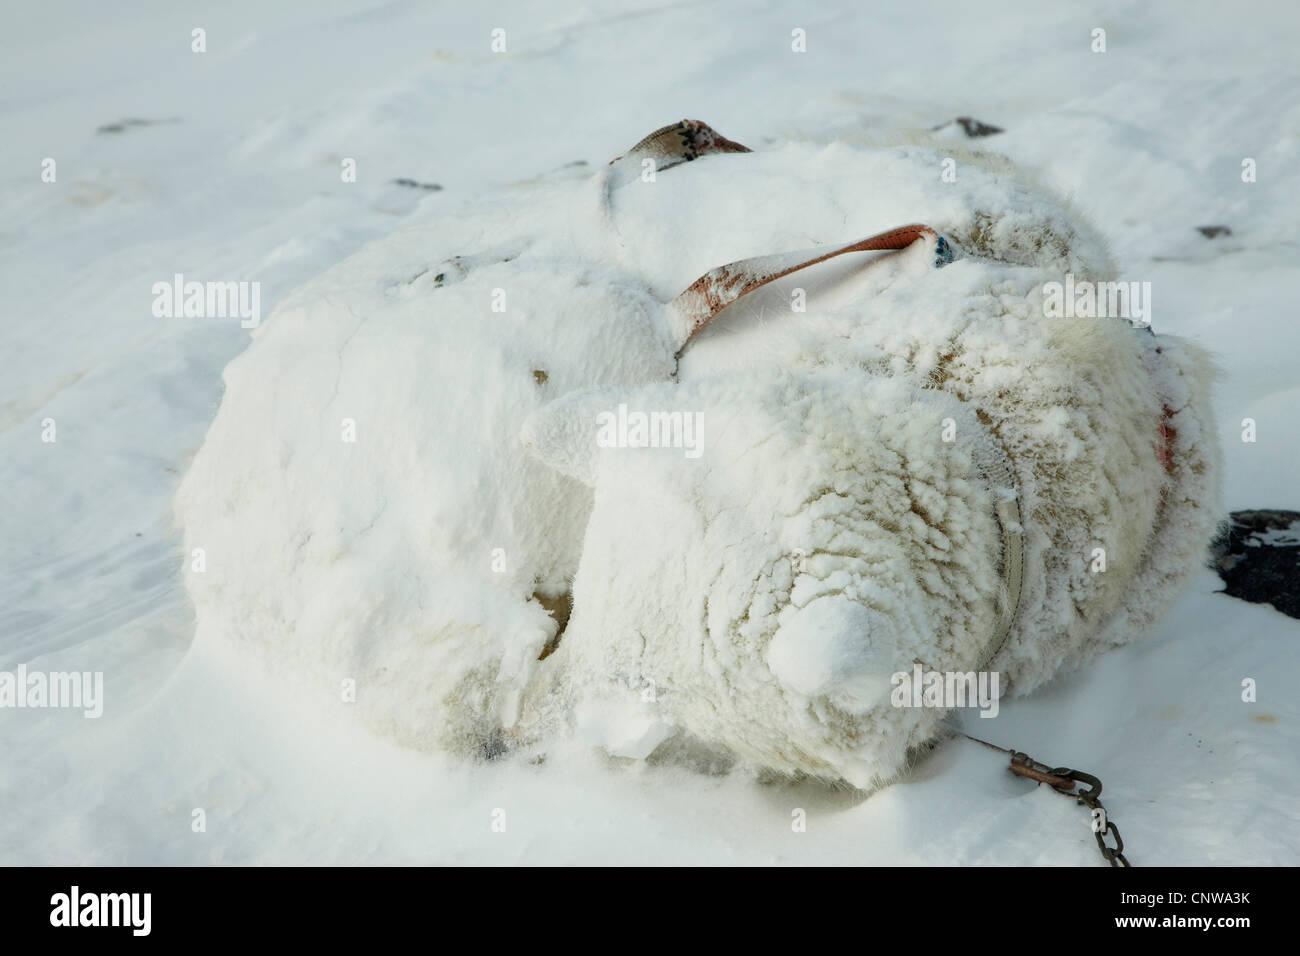 Greenland Dog (Canis lupus f. familiaris), coiled up in snow storm, Greenland, Ostgroenland, Tunu, Kalaallit Nunaat, Stock Photo